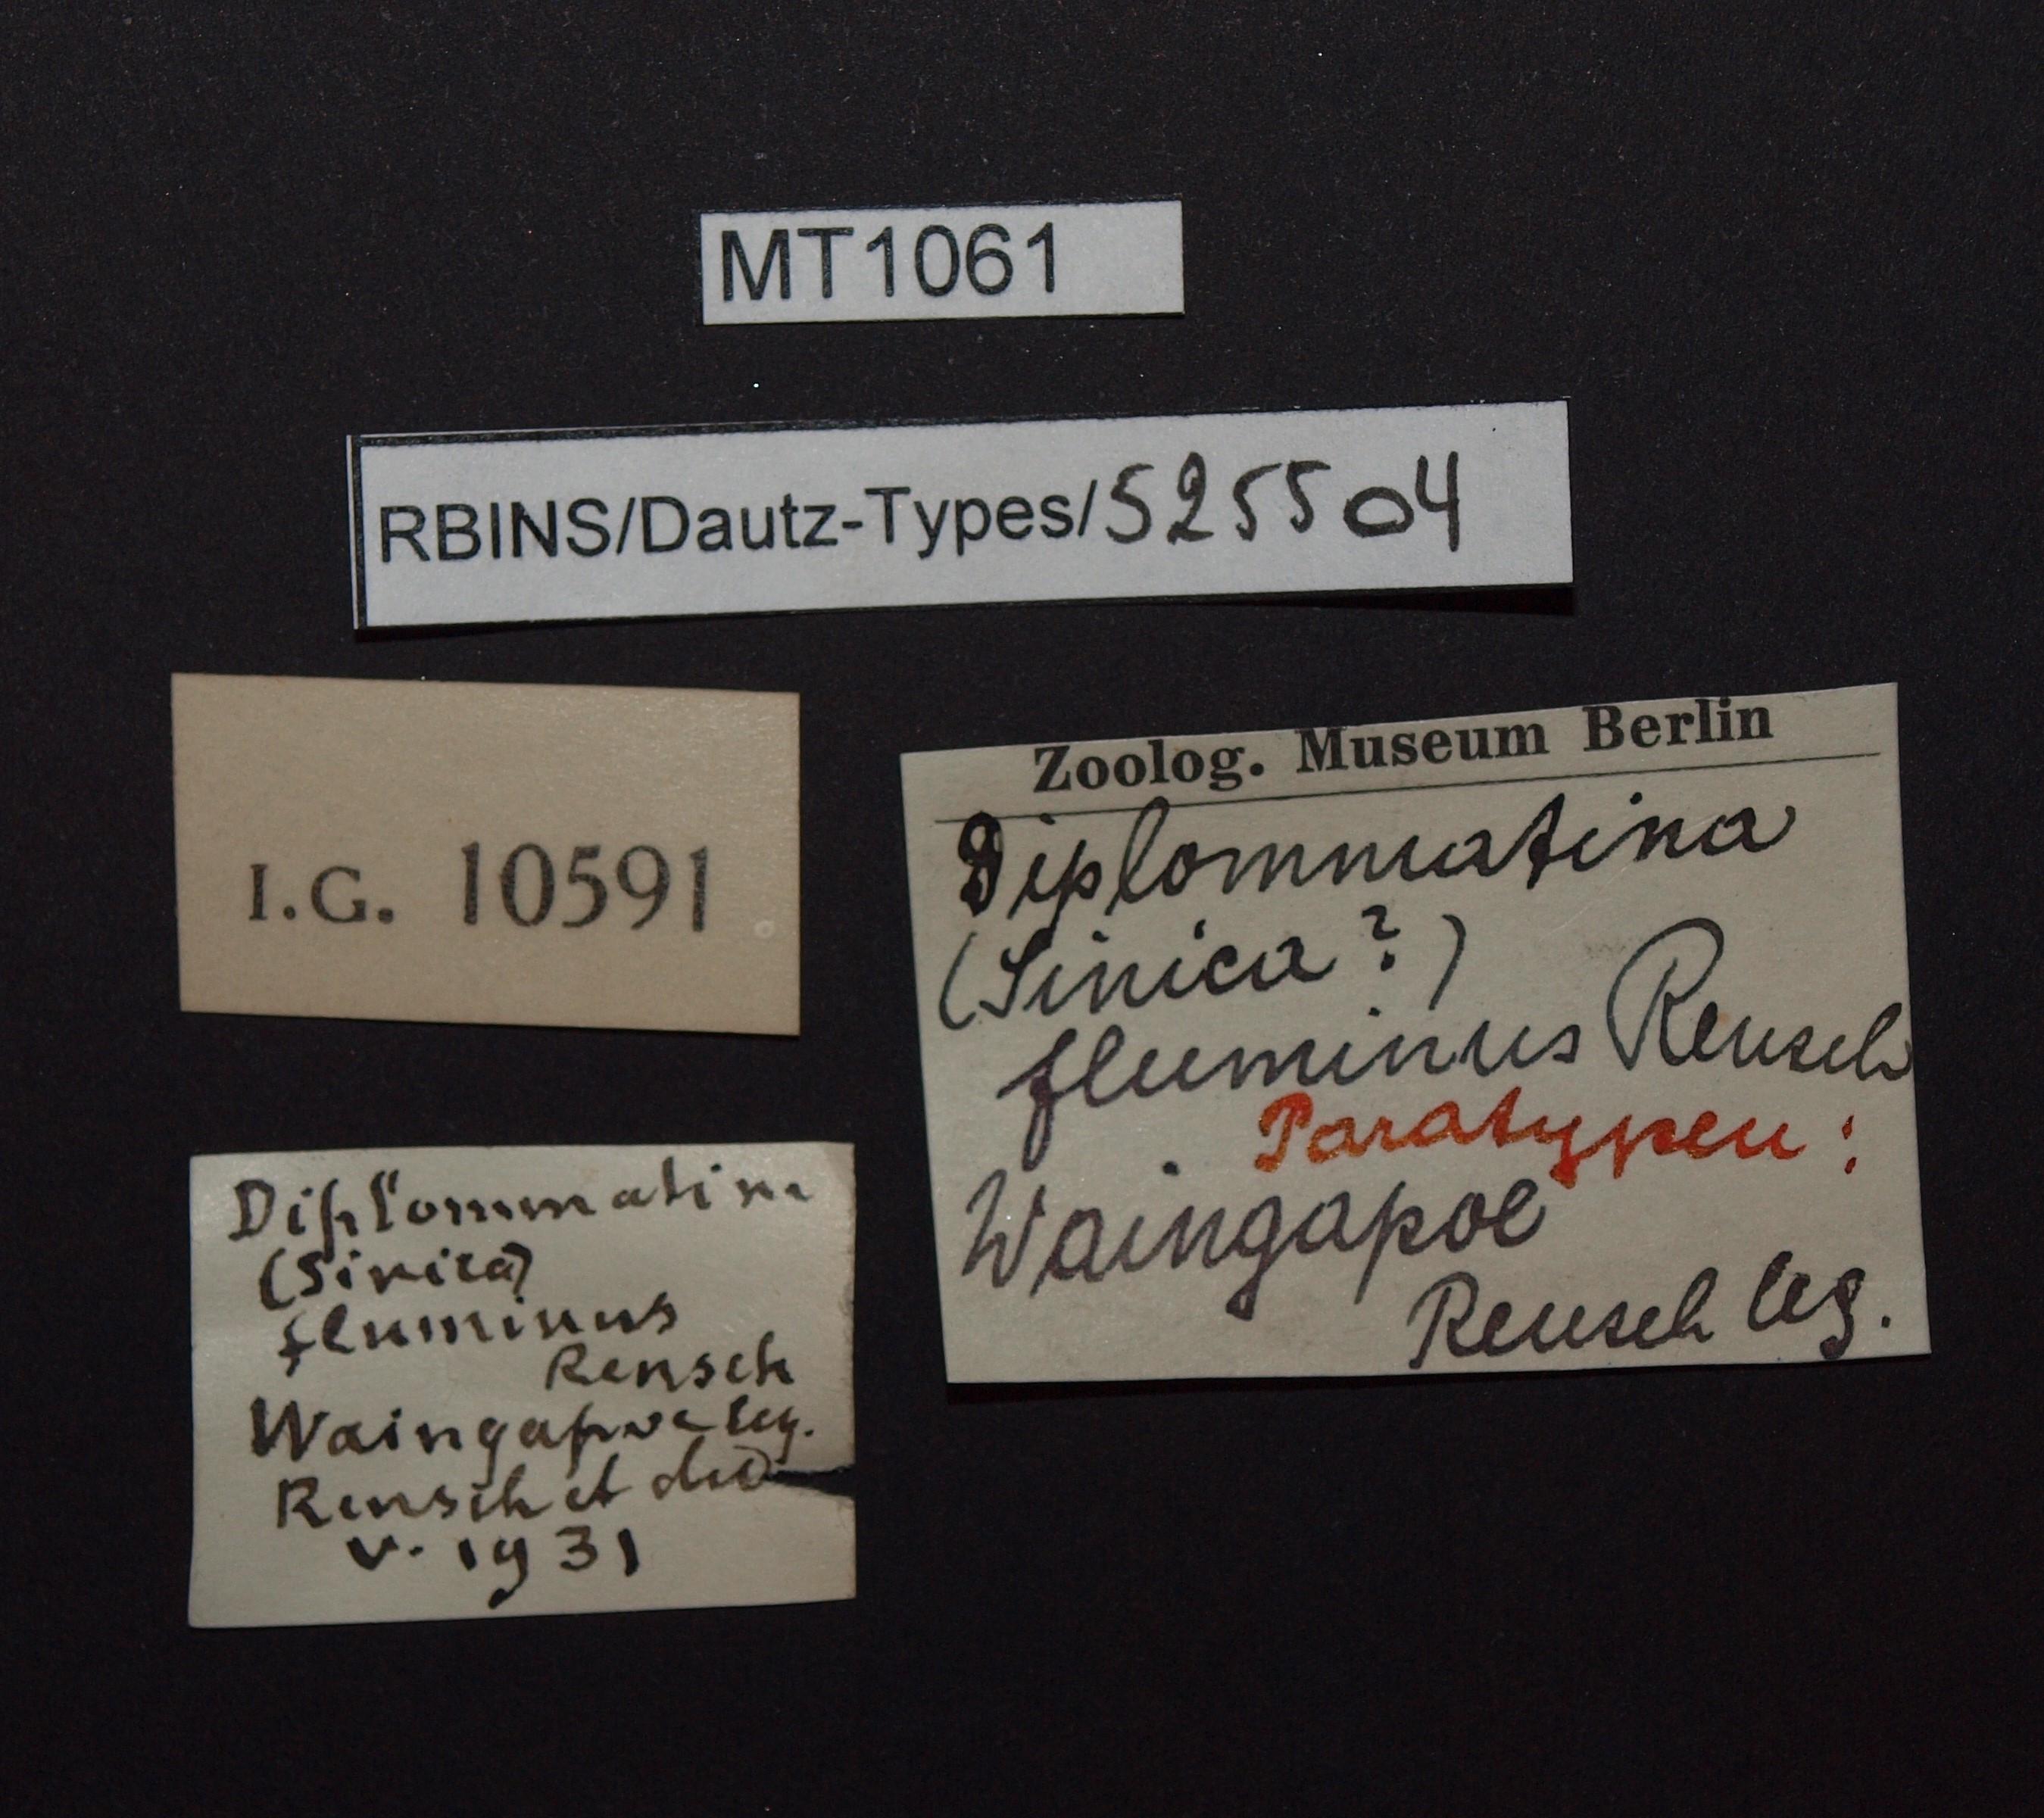 BE-RBINS-INV PARATYPE MT 1061 Diplommatina (Sinica) fluminus LABELS.jpg